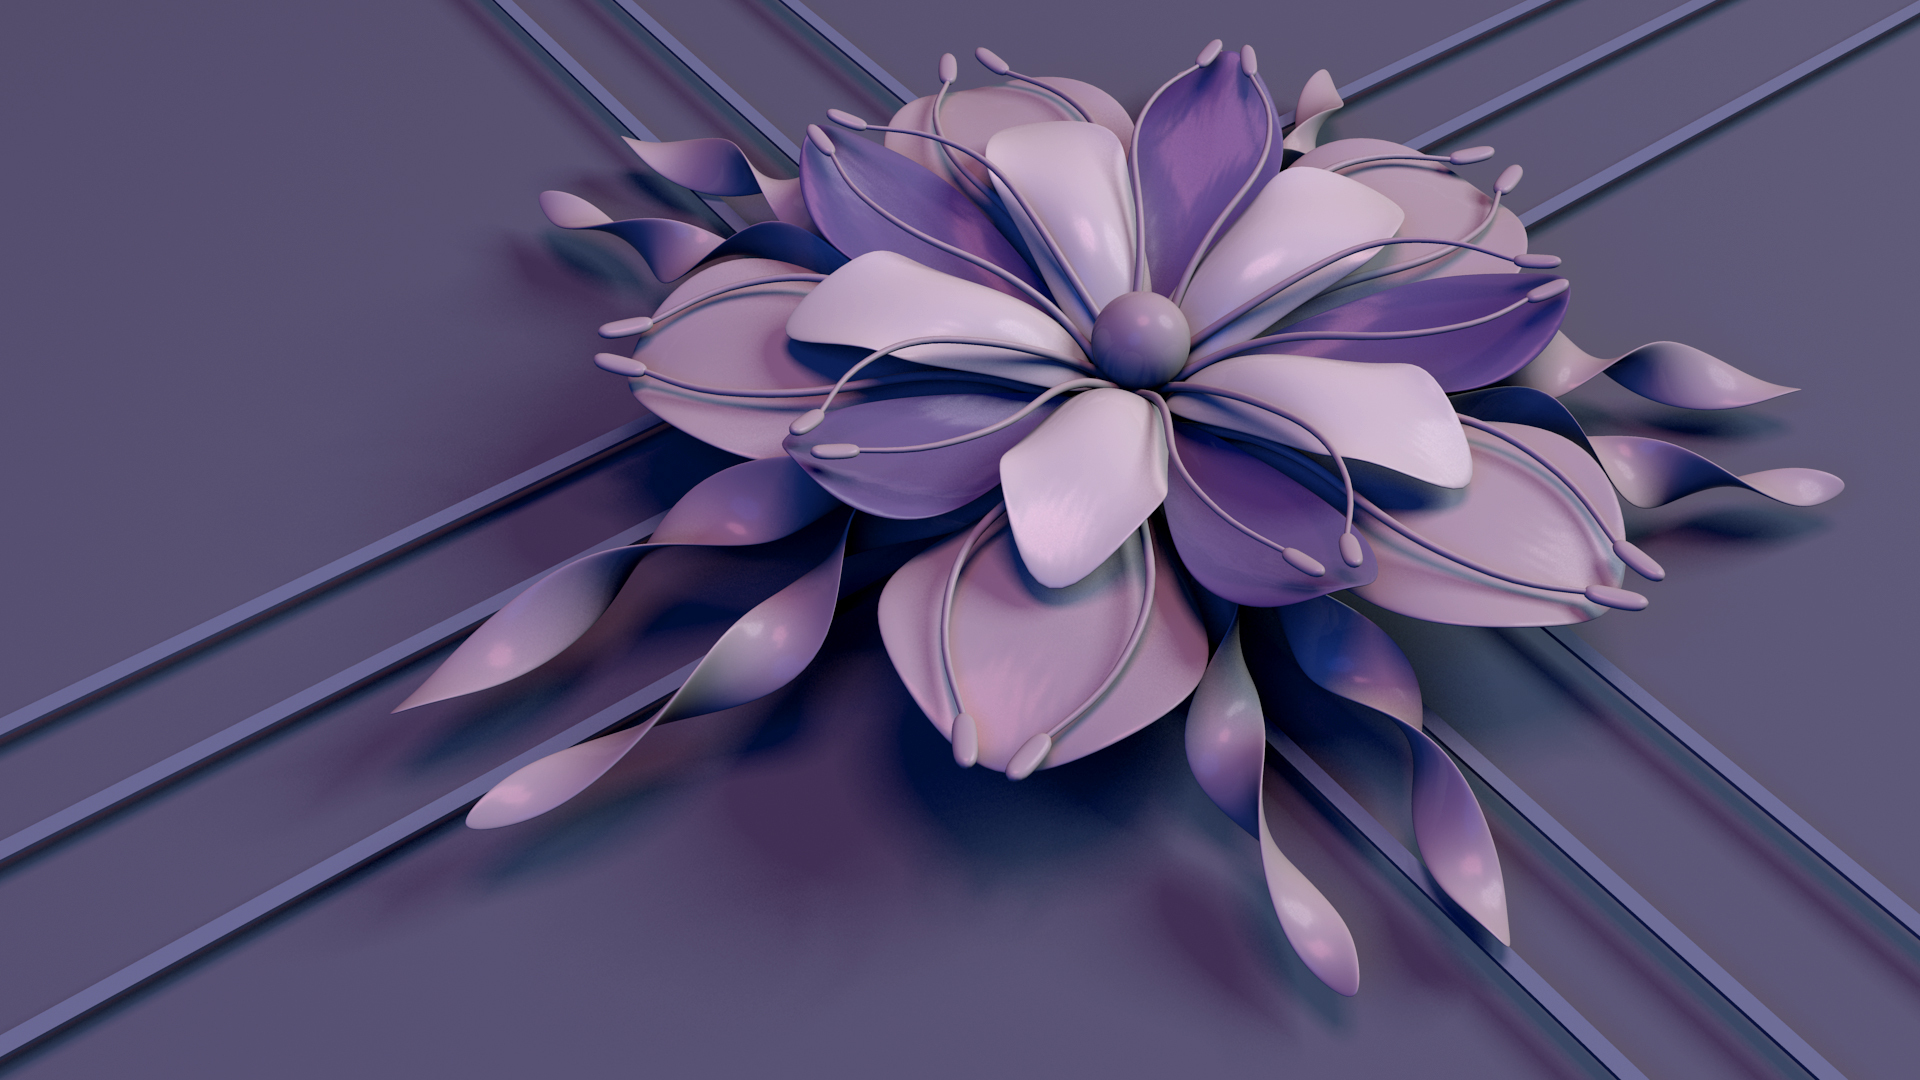 abstract flower beautiful purple 3d flower